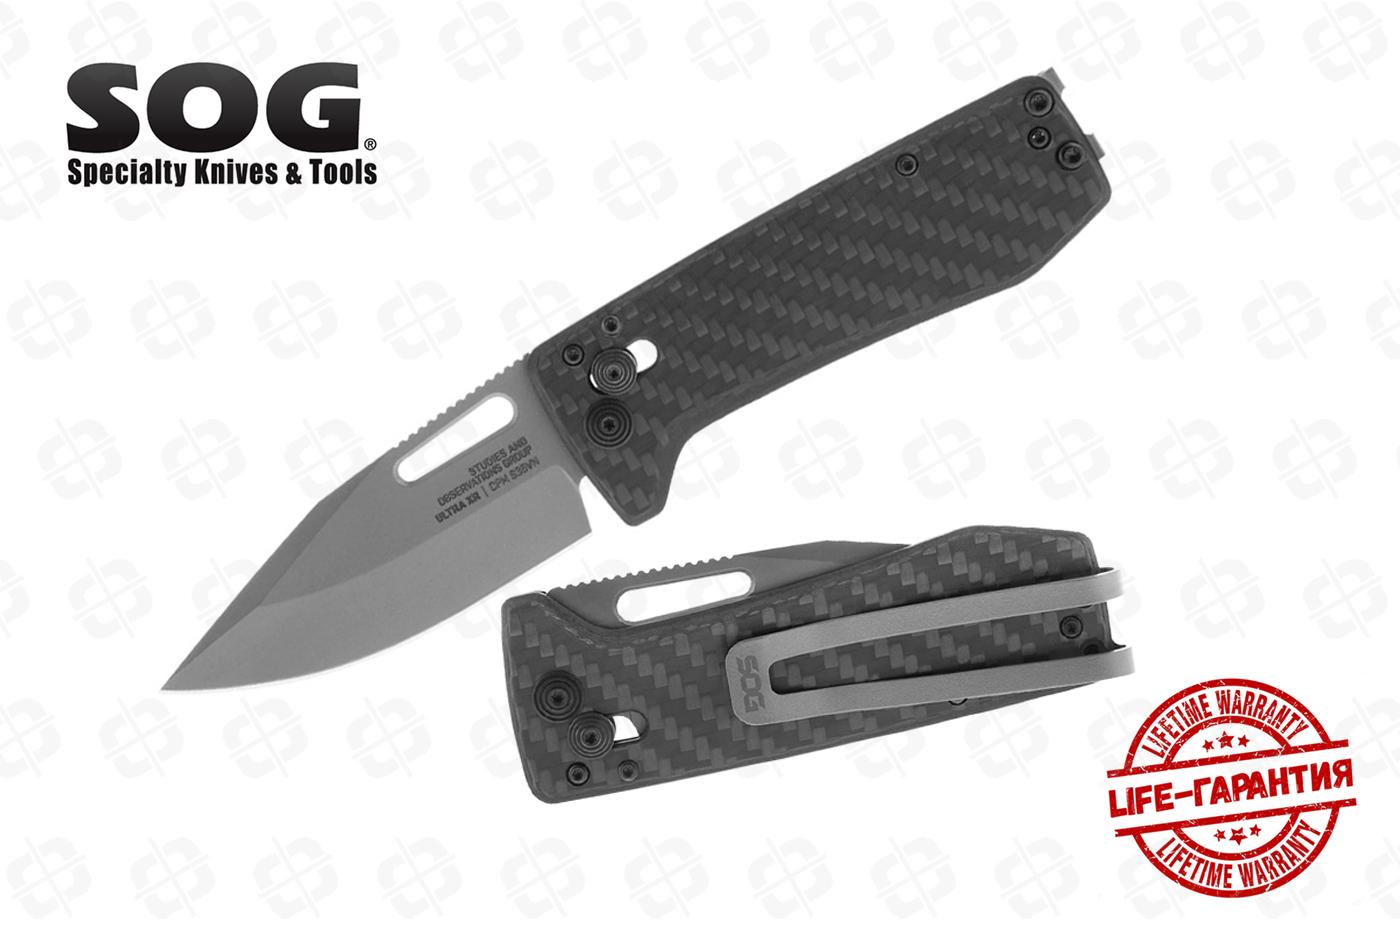 Нож SOG 12-63-01-57 Ultra XR Carbon+Graphite